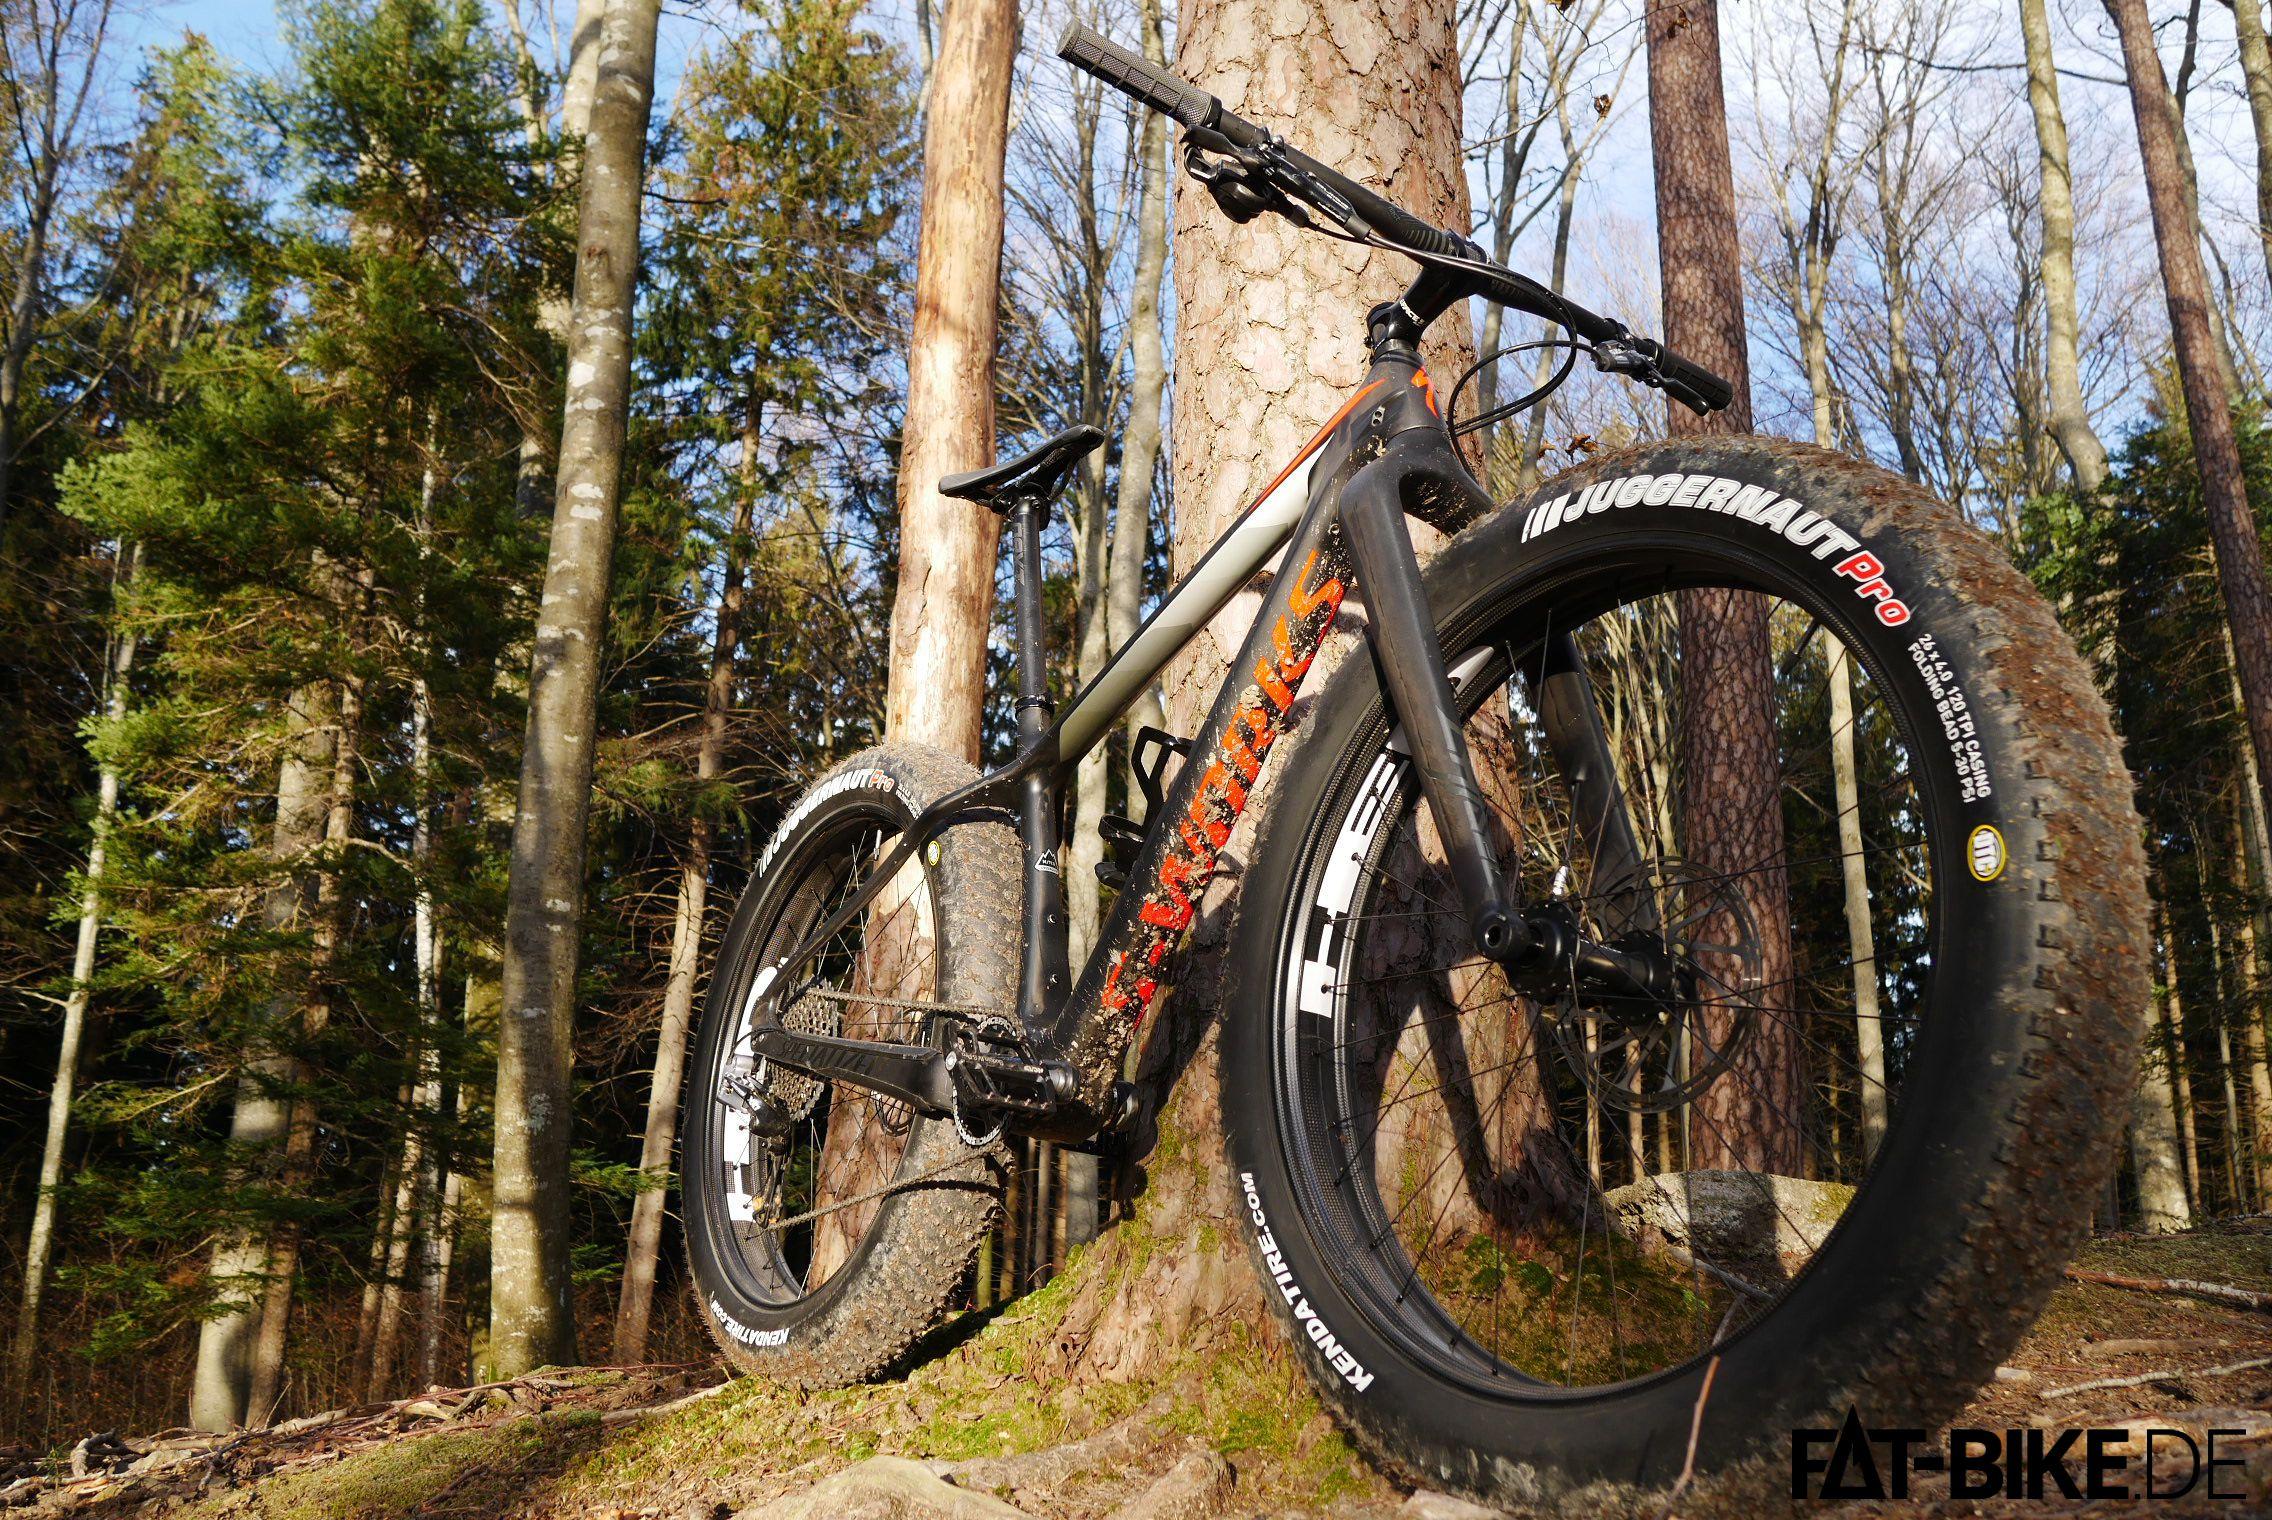 The Kenda Juggernaut 4.0 Pro is the lightest FATBike tire